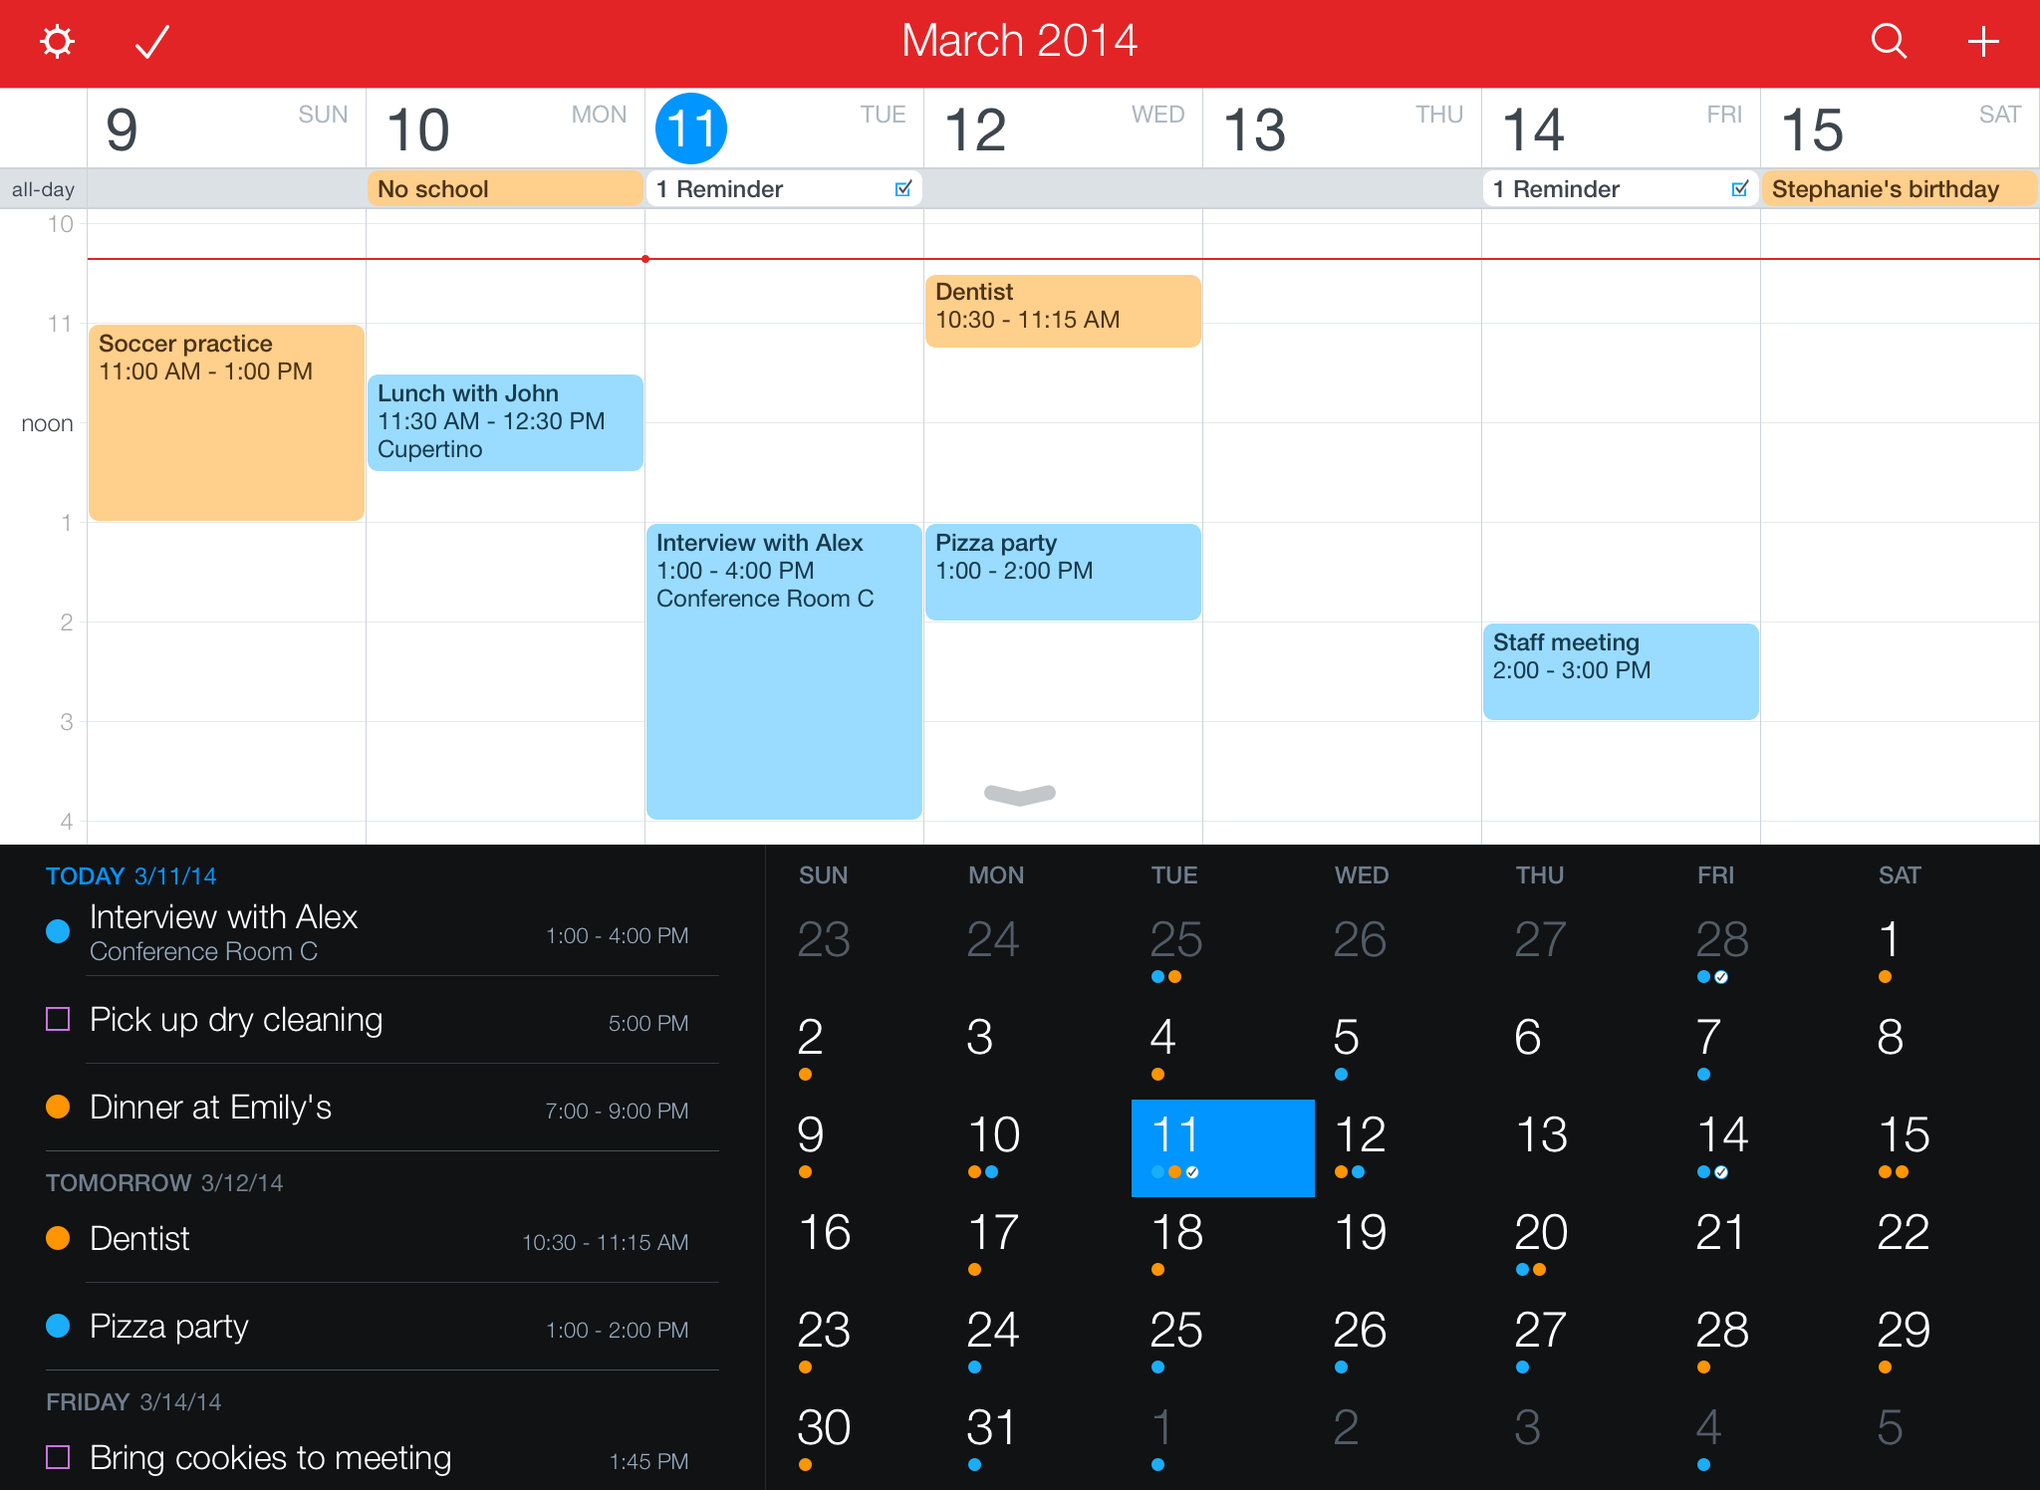 Free cross platform calendar app with to-do lists? : productivity